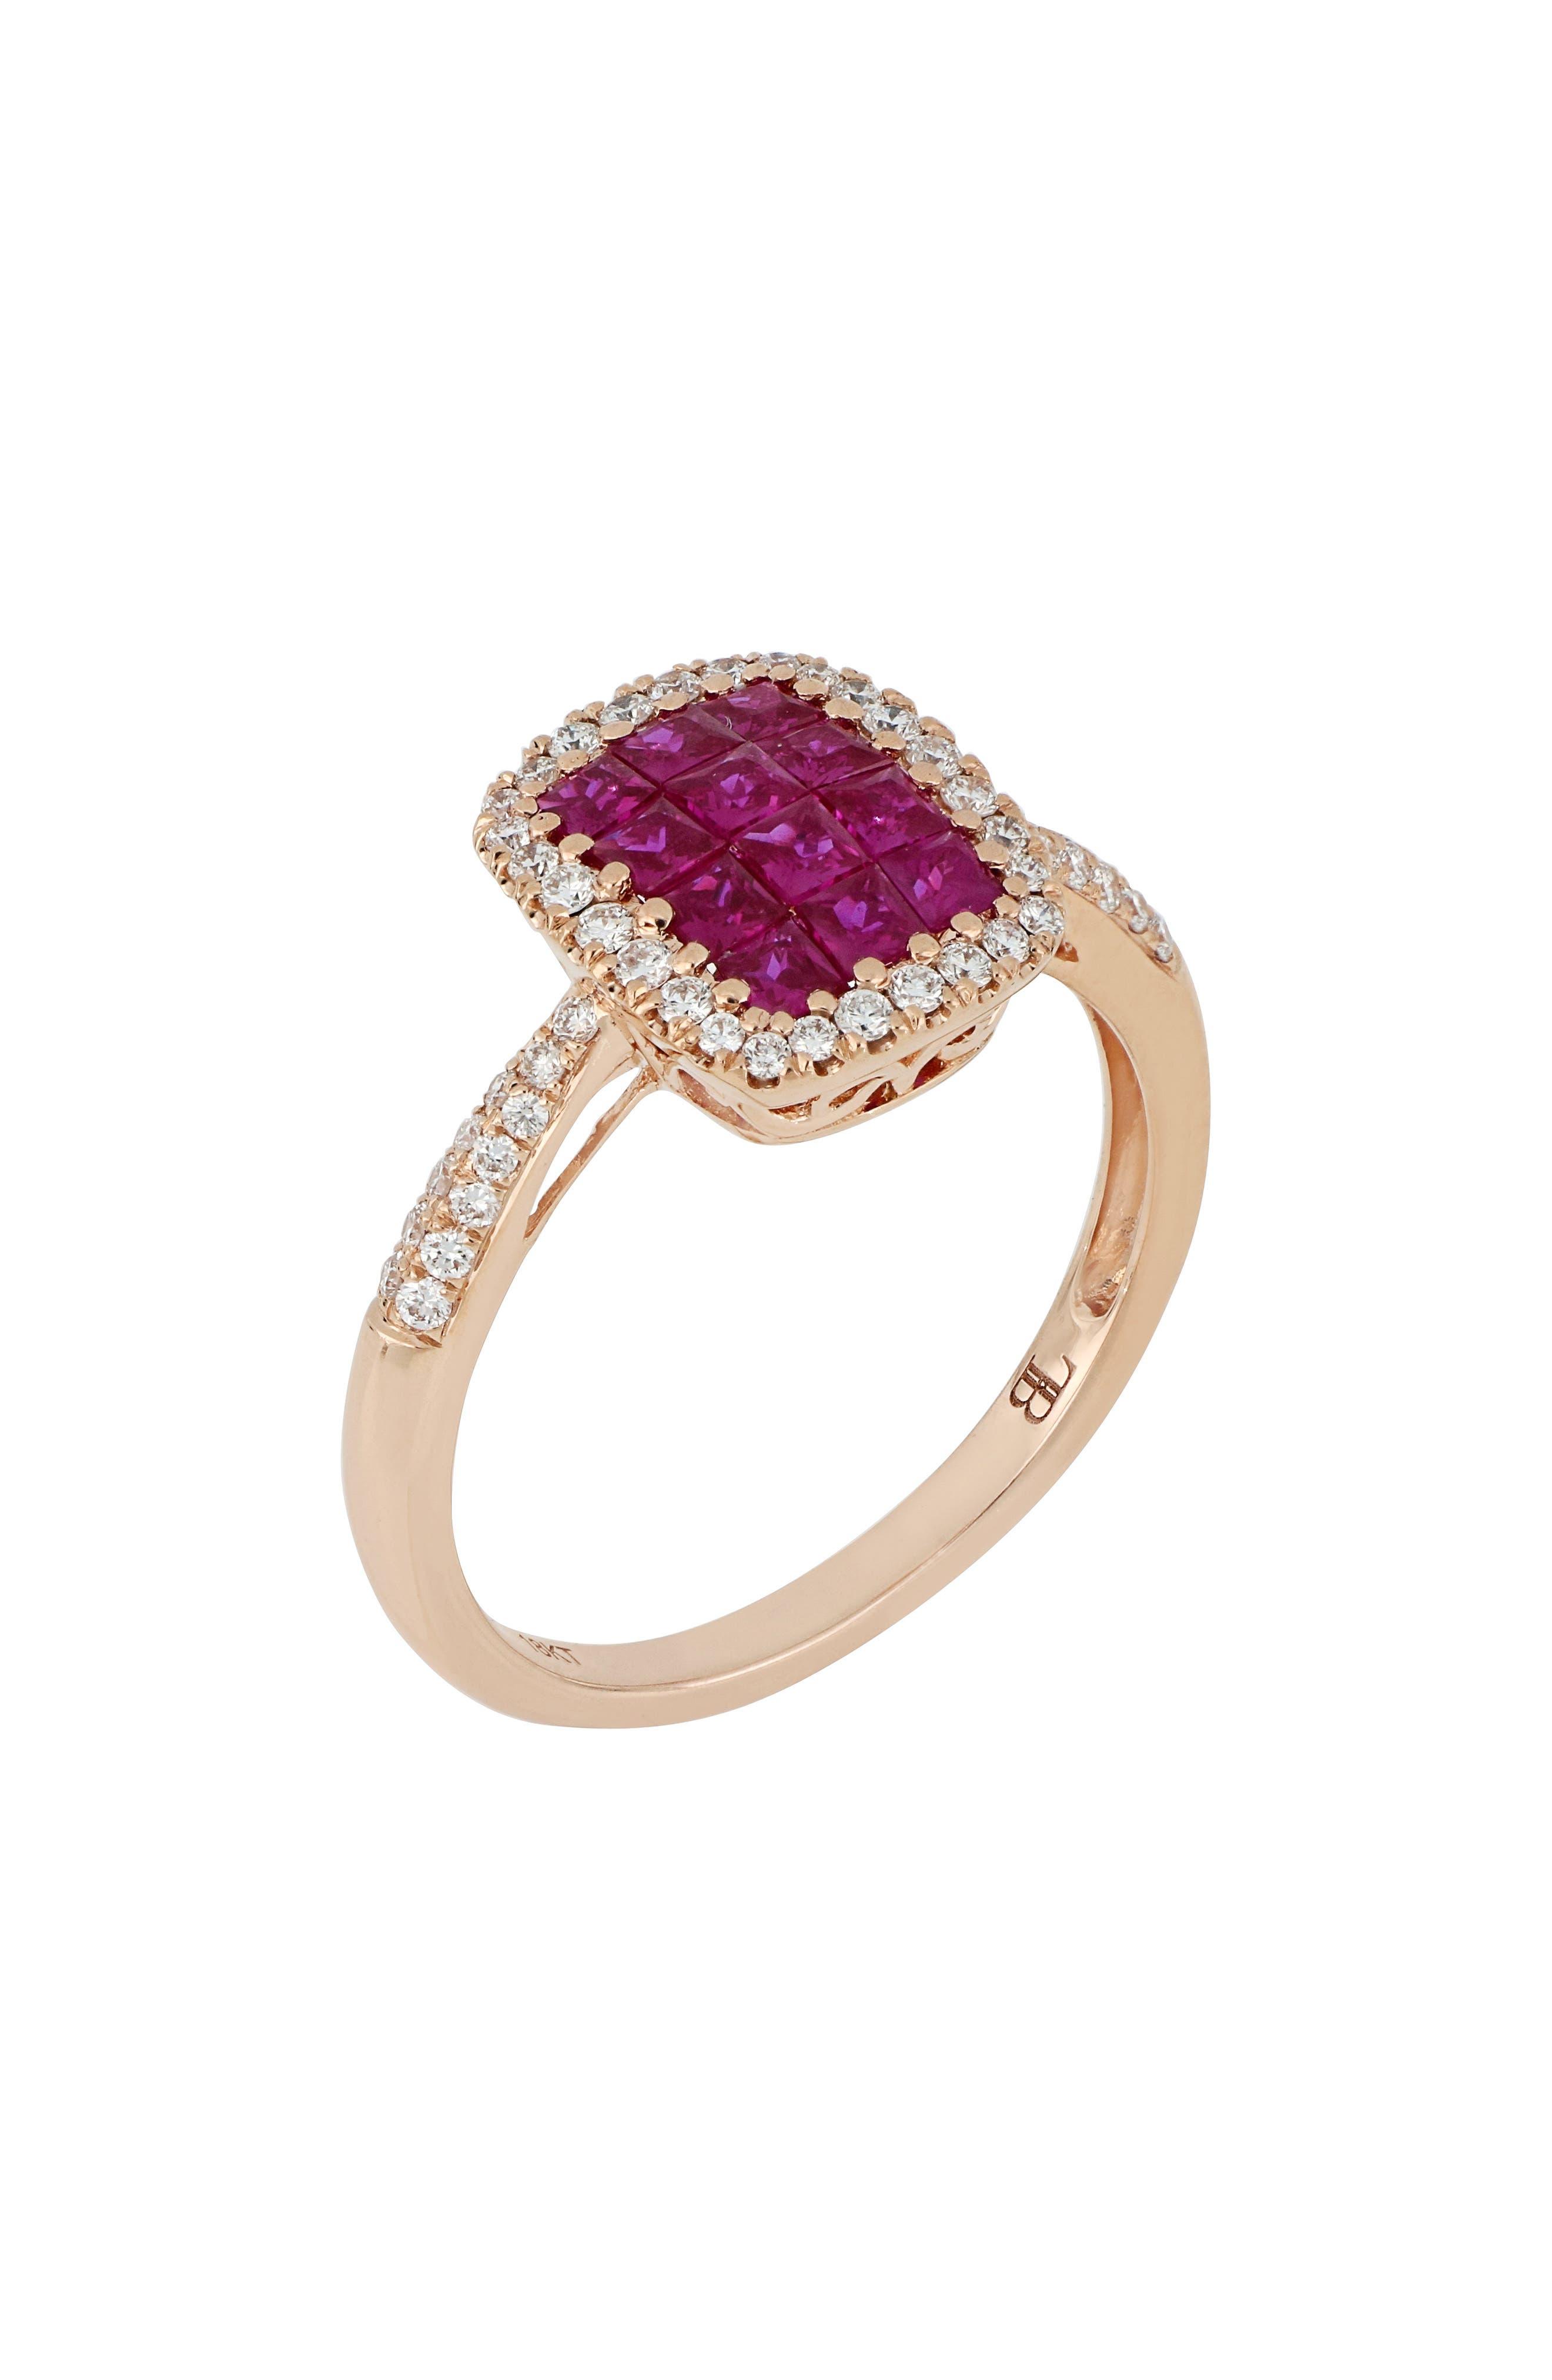 Ruby & Diamond Ring,                             Main thumbnail 1, color,                             ROSE GOLD